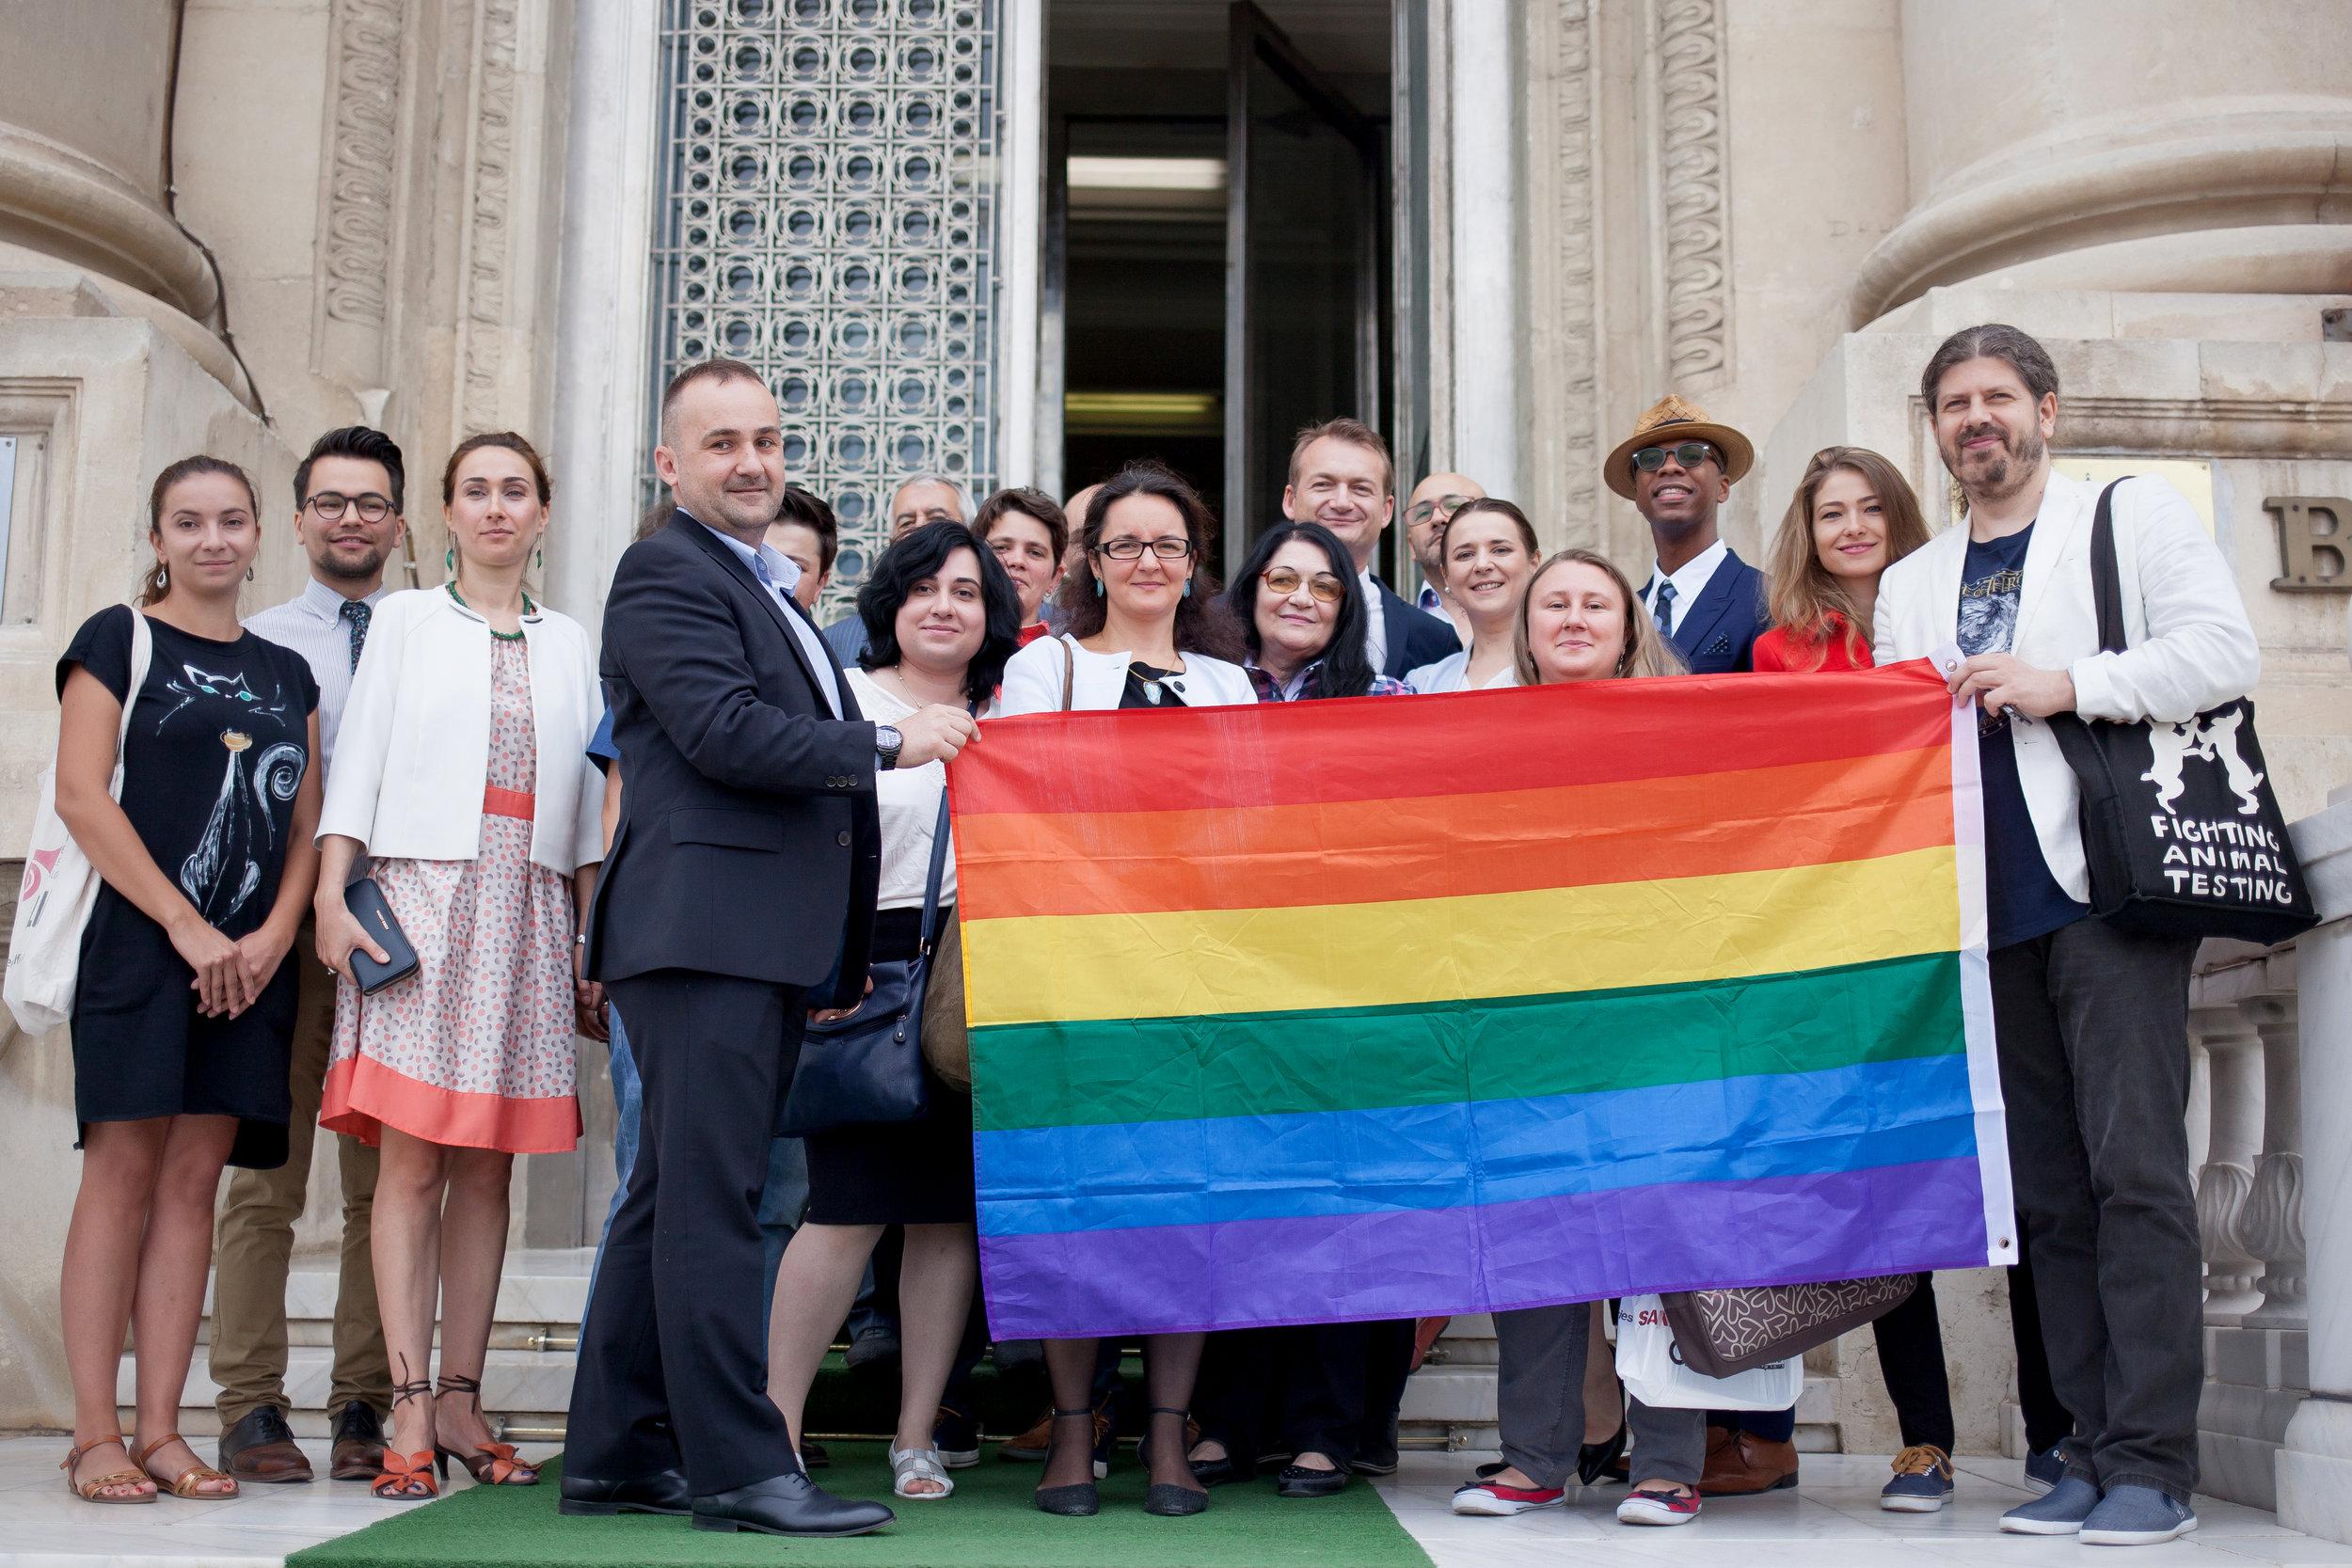 adrian-coman-clai-hamilton-gay-spousal-marriage-equality-rights-romania-european-union-bro-bear-blog-4.jpg